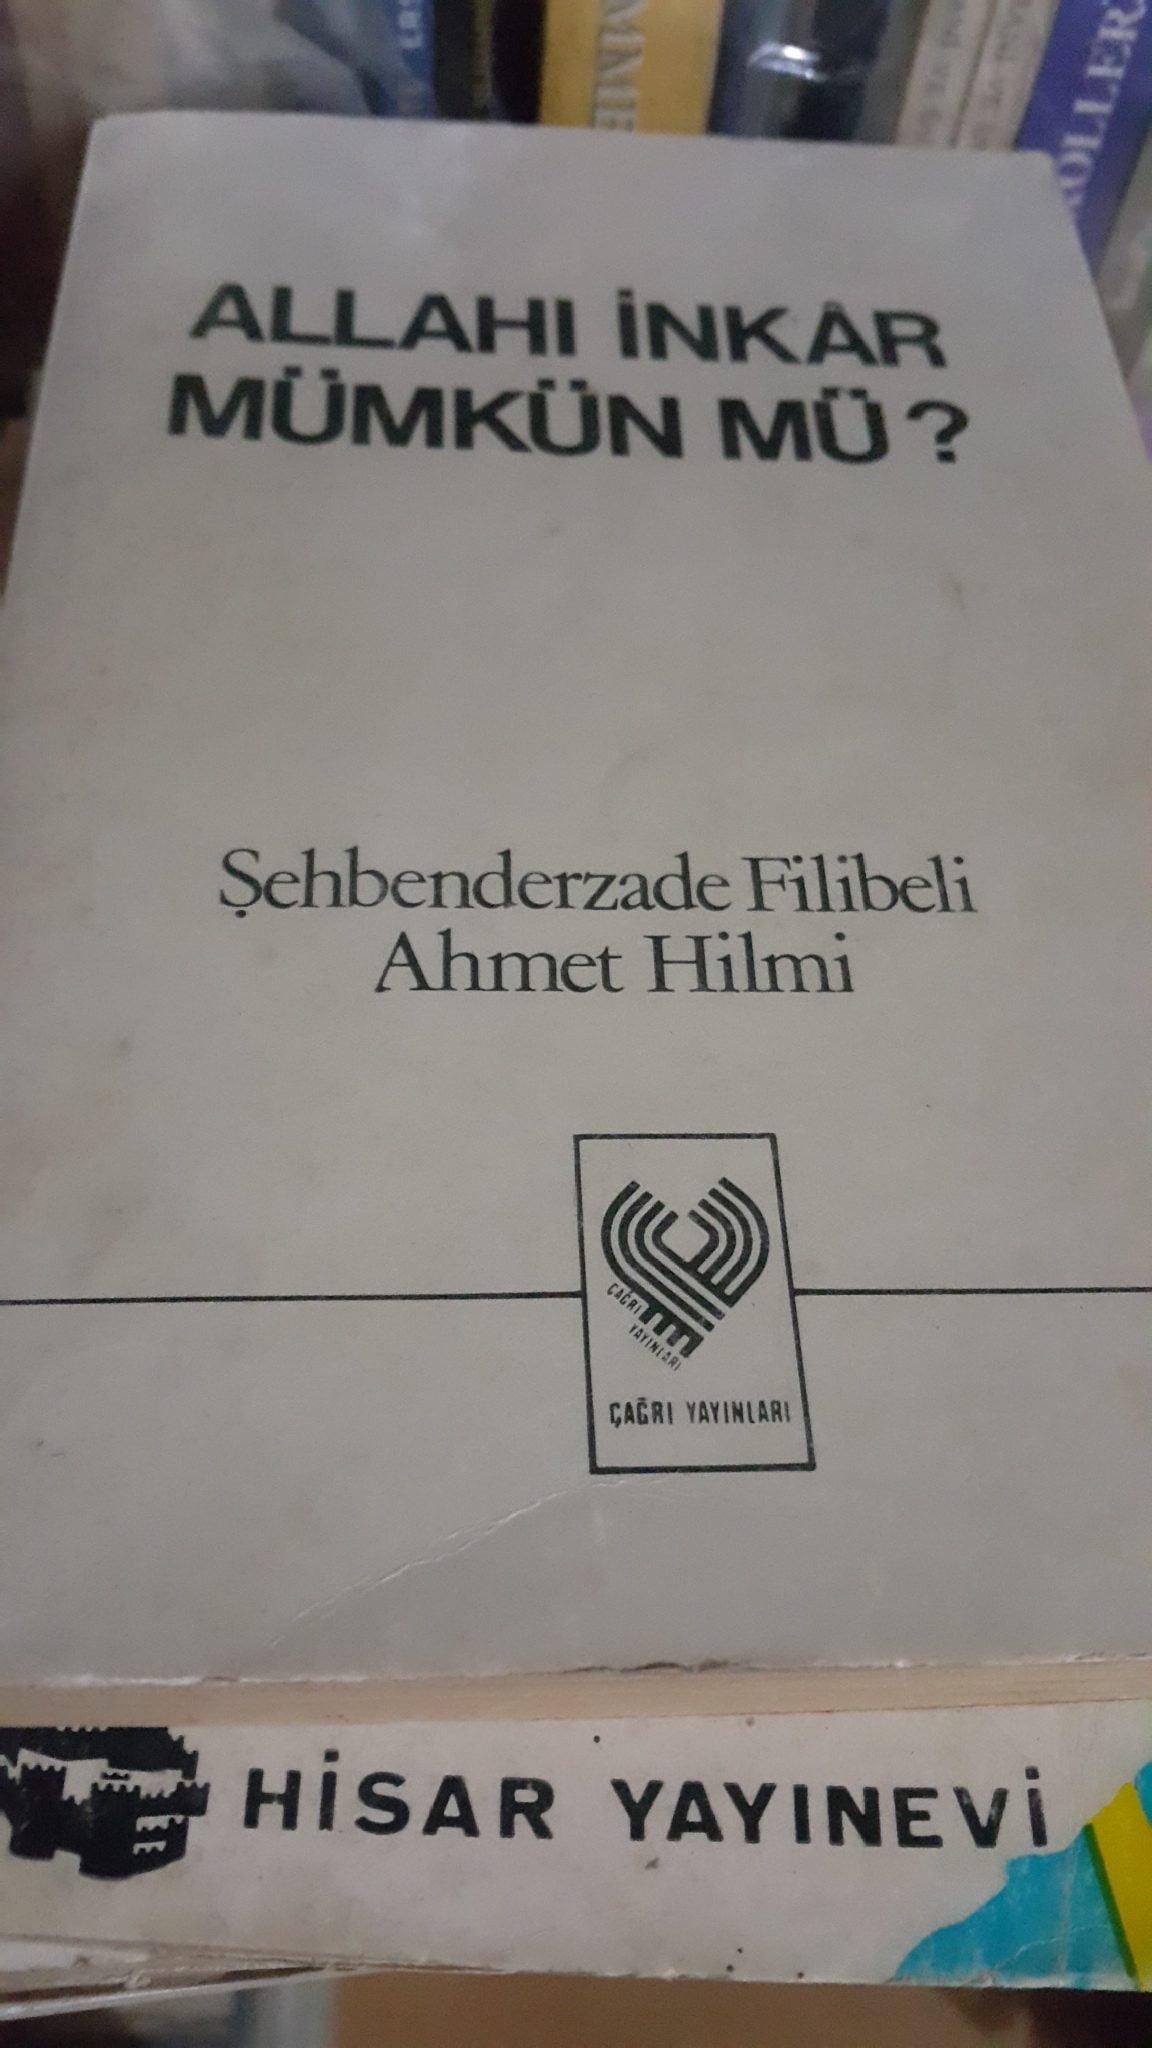 ALLAH'I İNKAR MÜMKÜN MÜ?/Filibeli Ahmed Hilmi